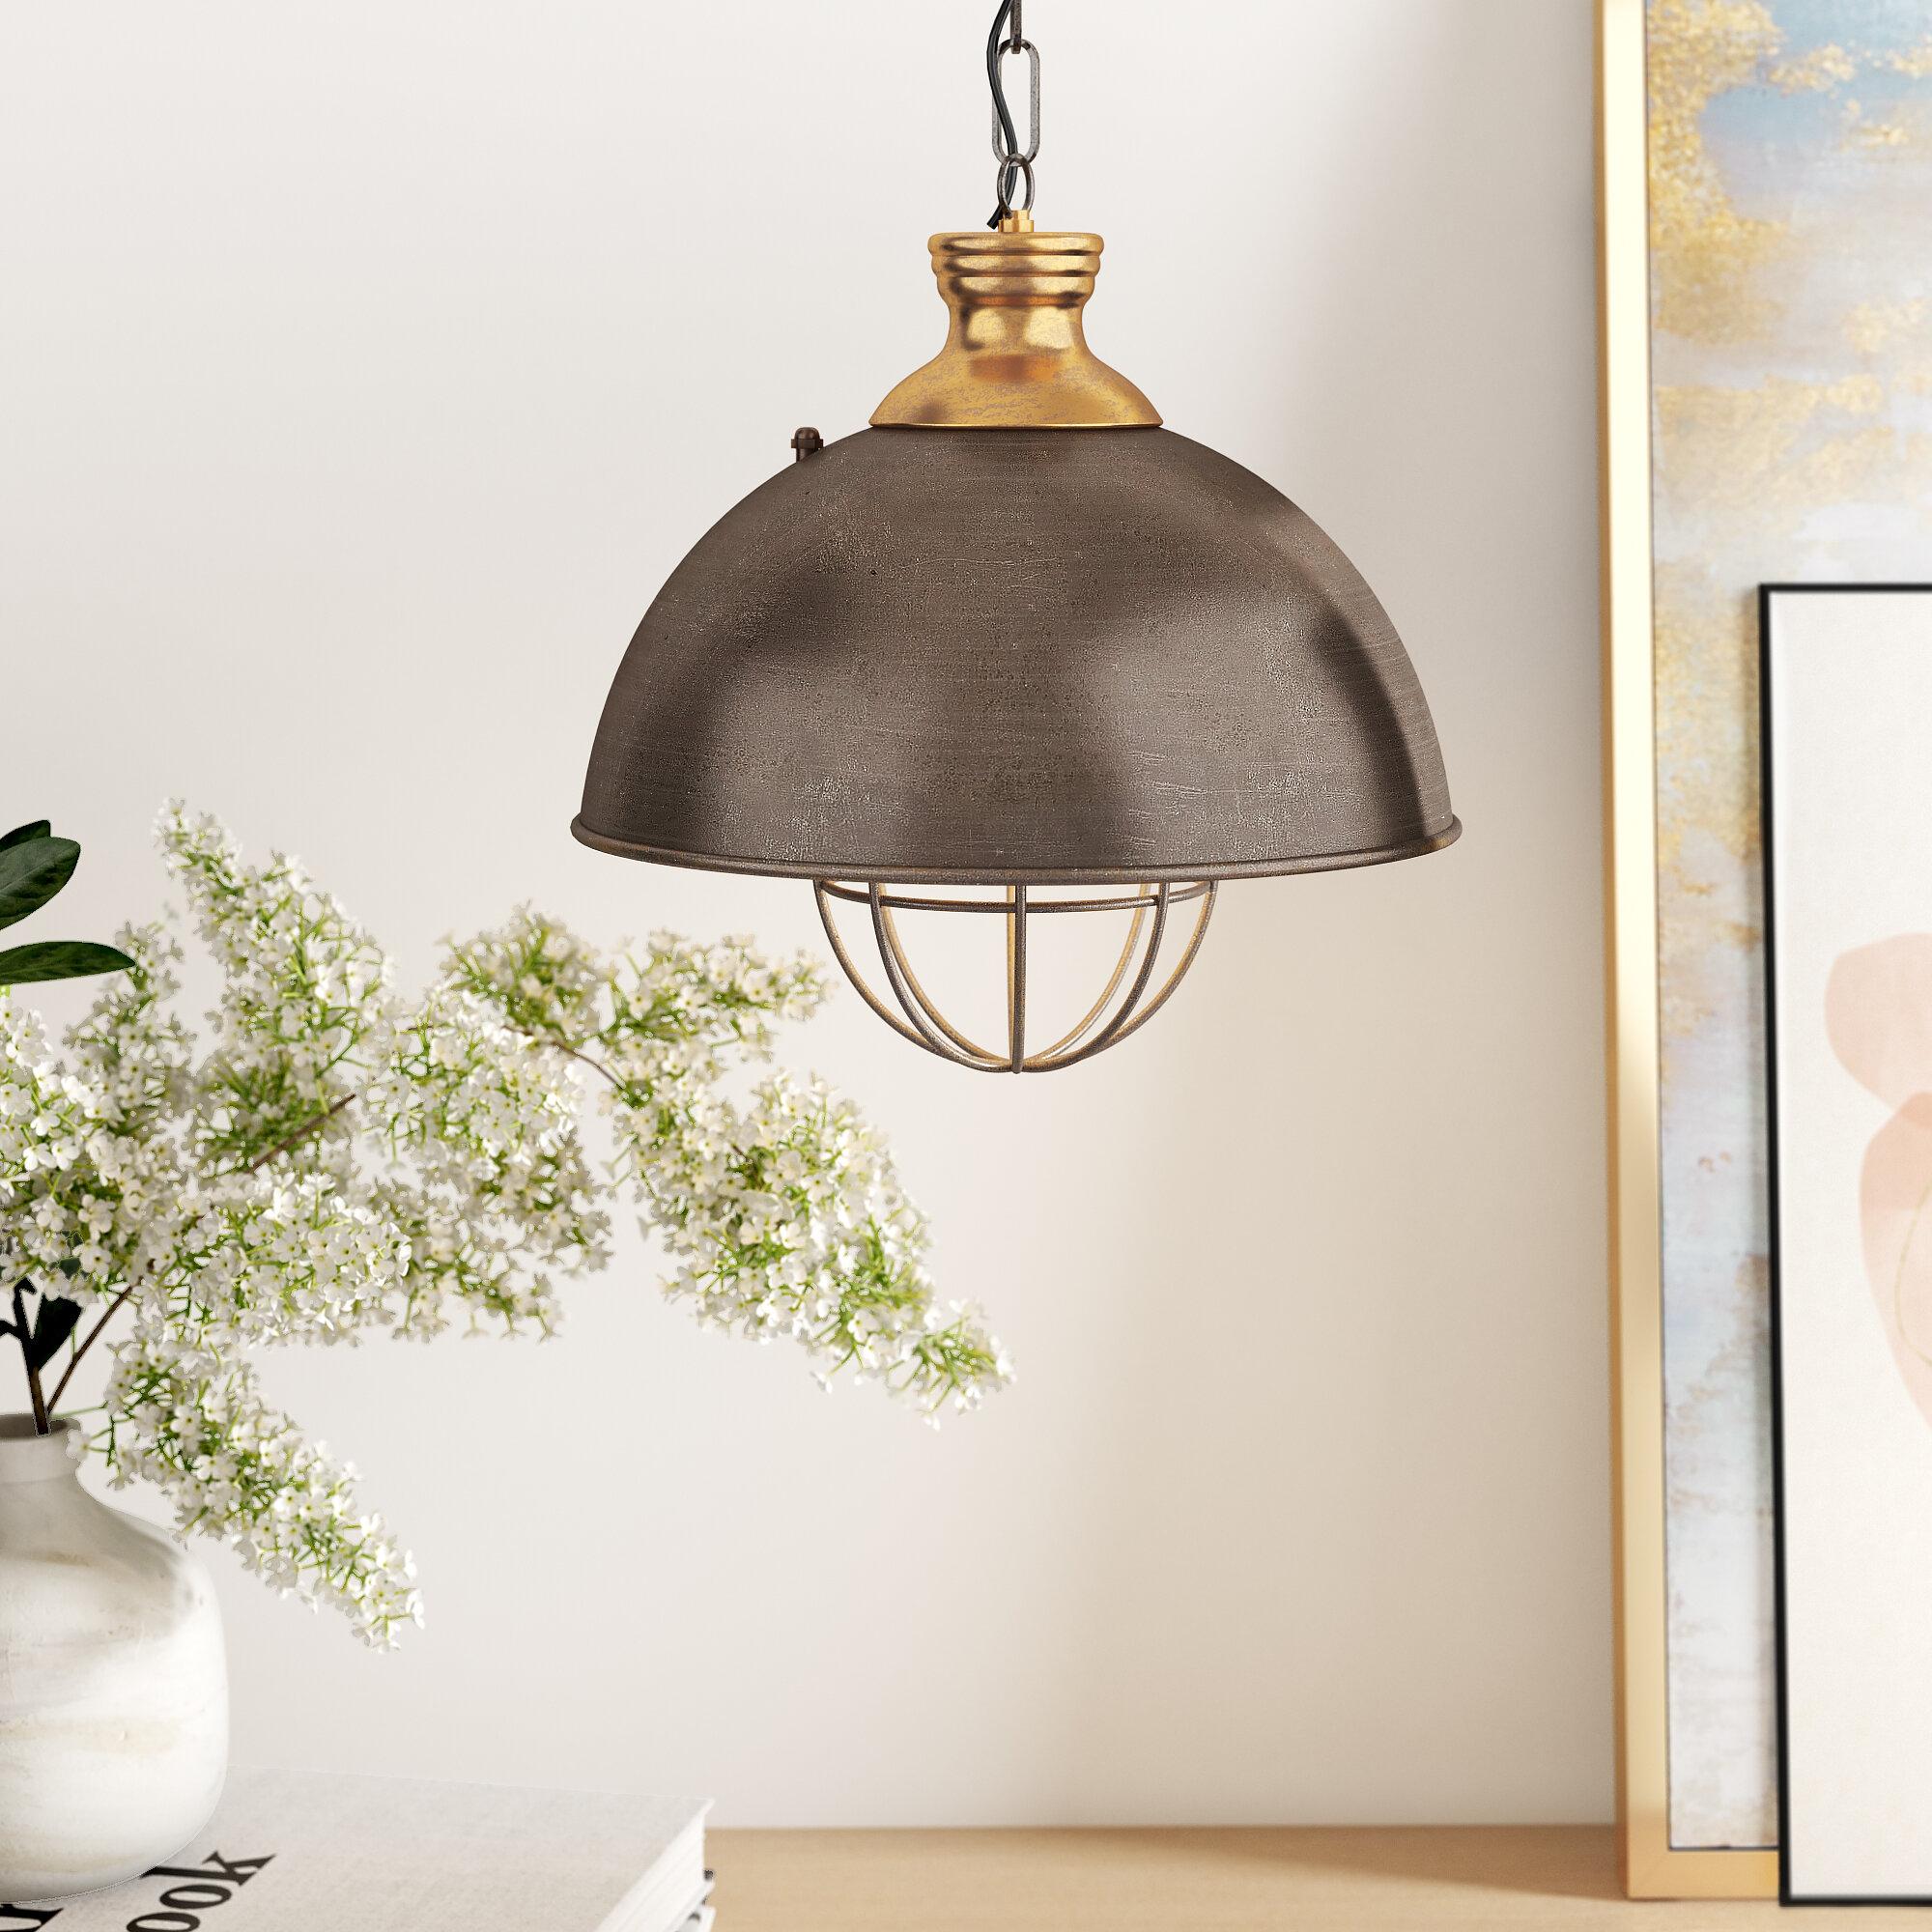 Olathe 1 Light Single Dome Pendant & Reviews | Joss & Main Throughout Prange 1 Light Single Globe Pendants (View 14 of 30)